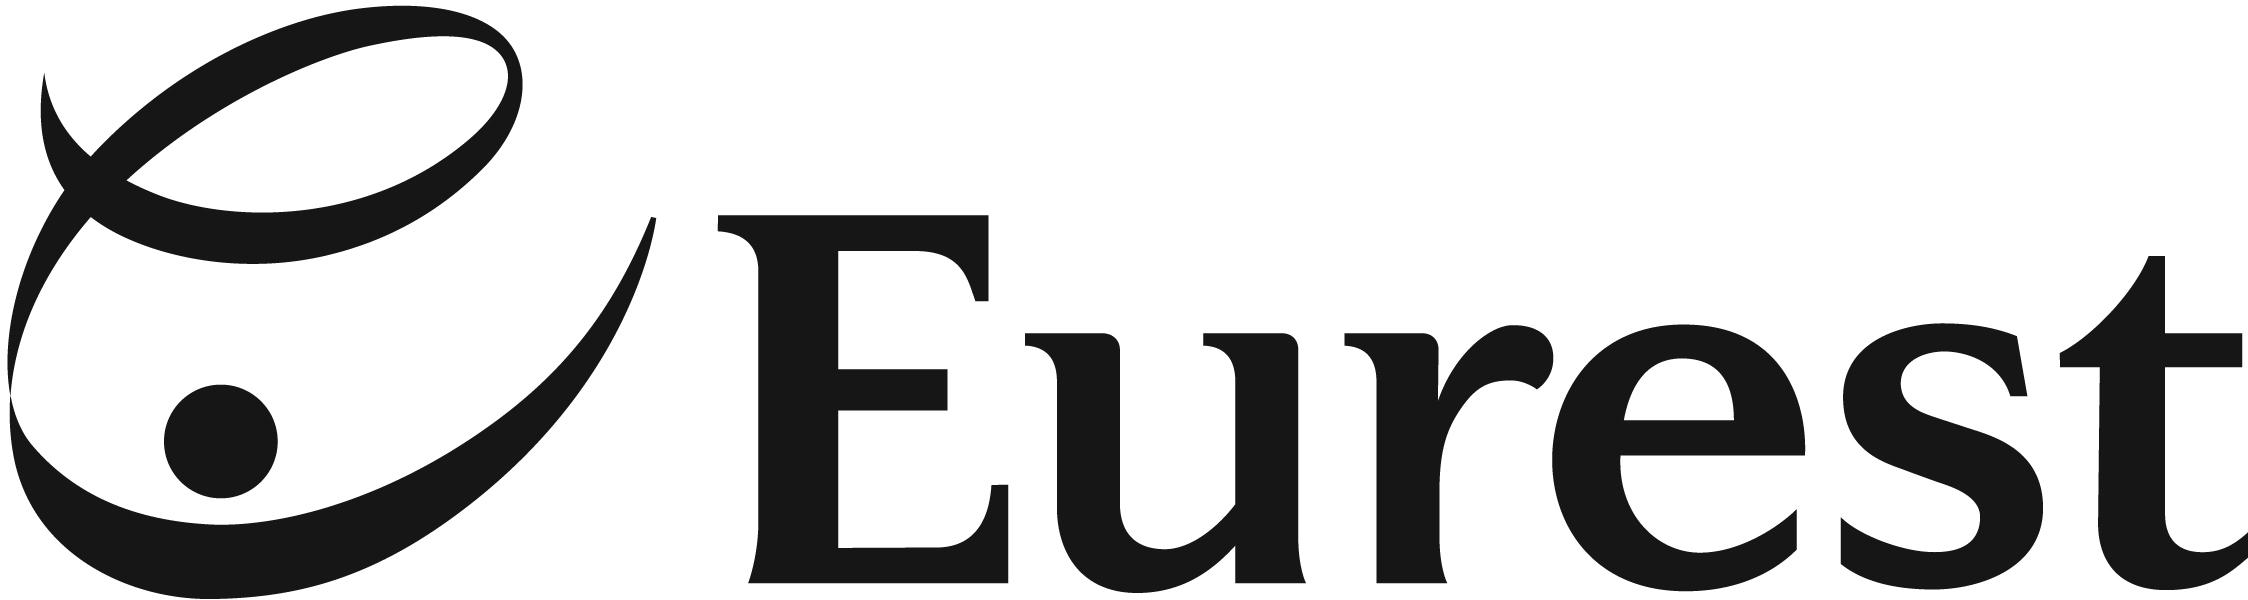 eurest_horizontal_black.jpg